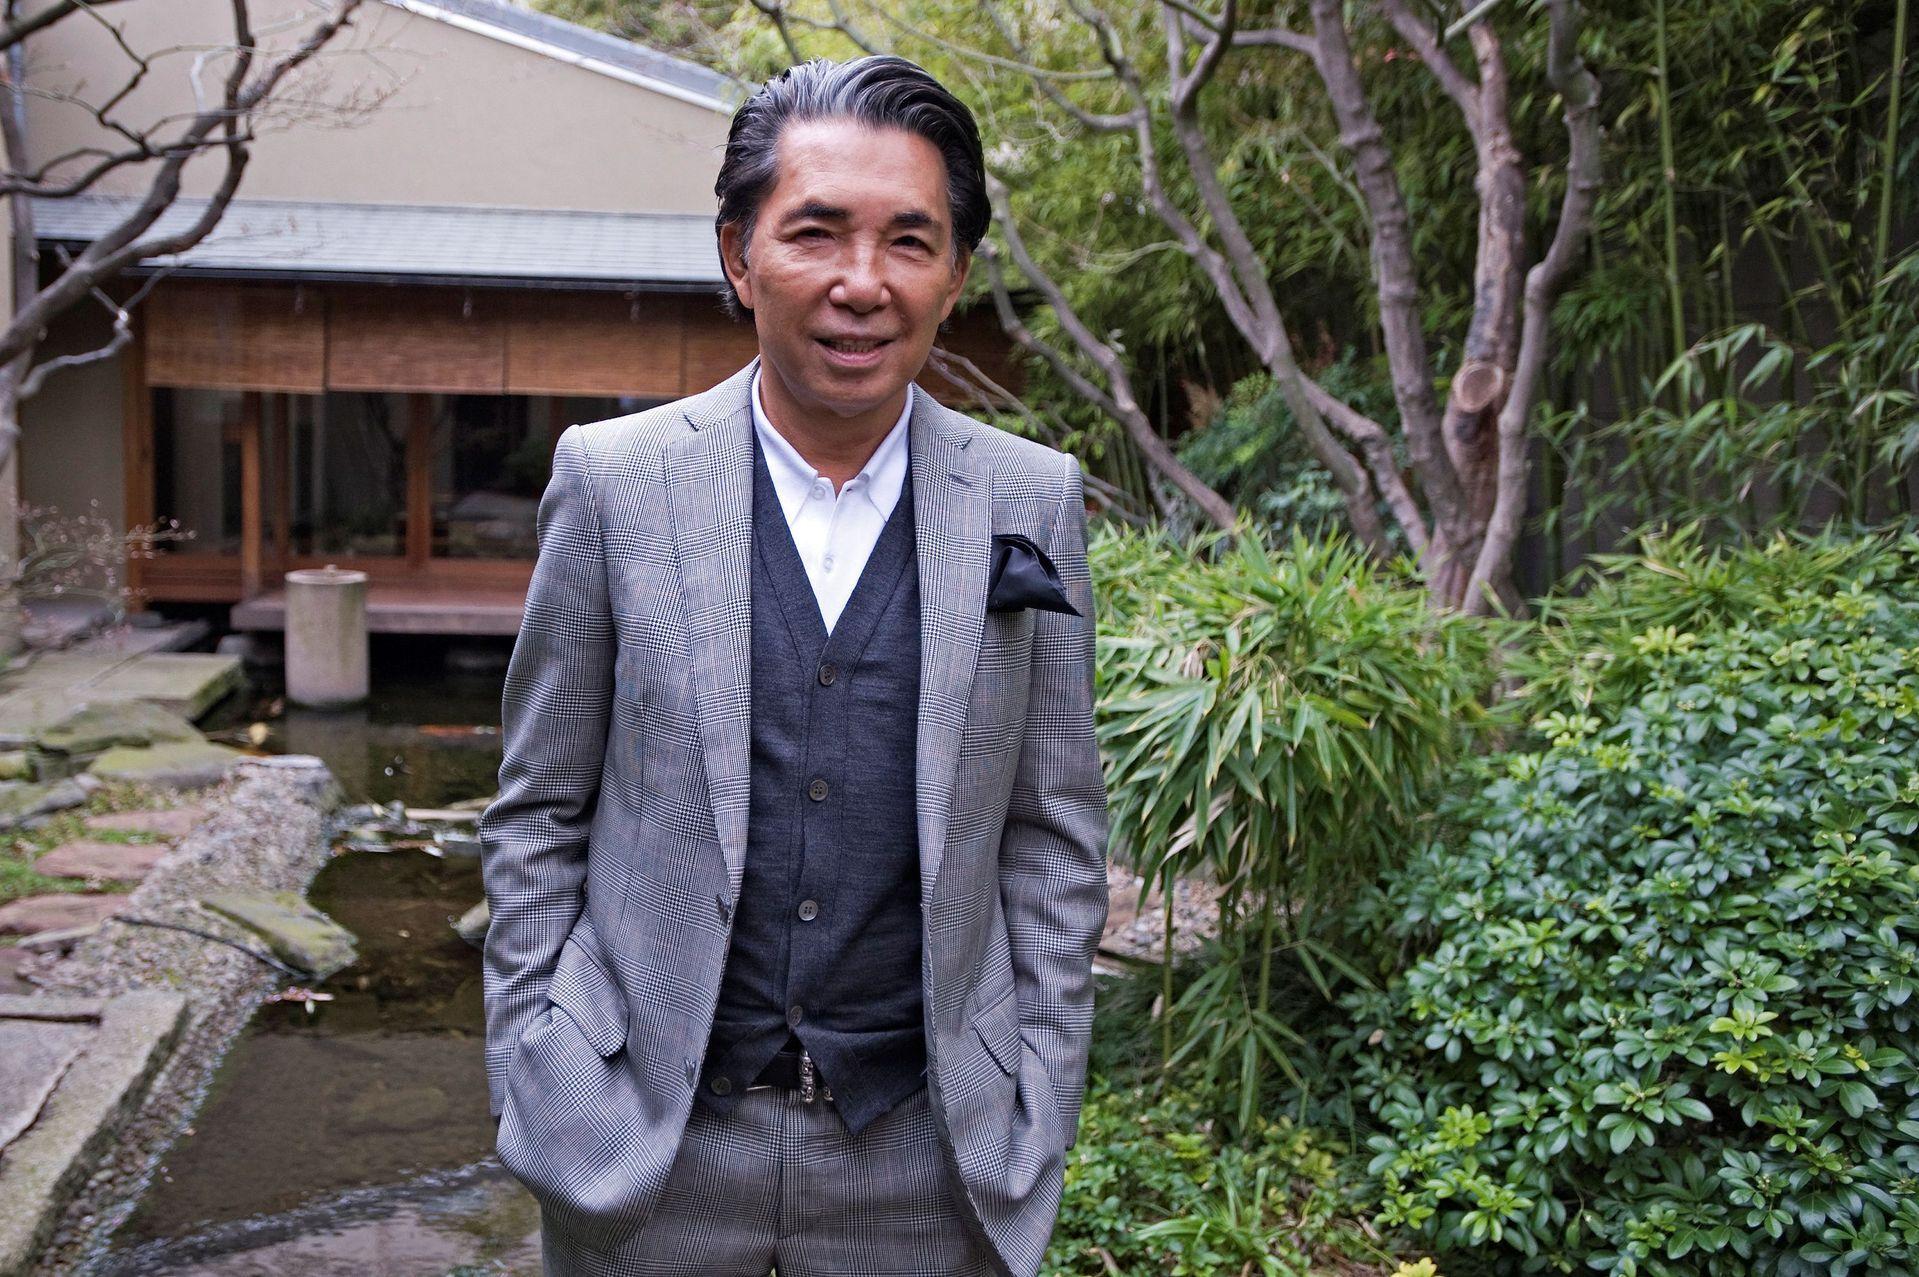 Japanese fashion designer Kenzo Takada dies from COVID-19